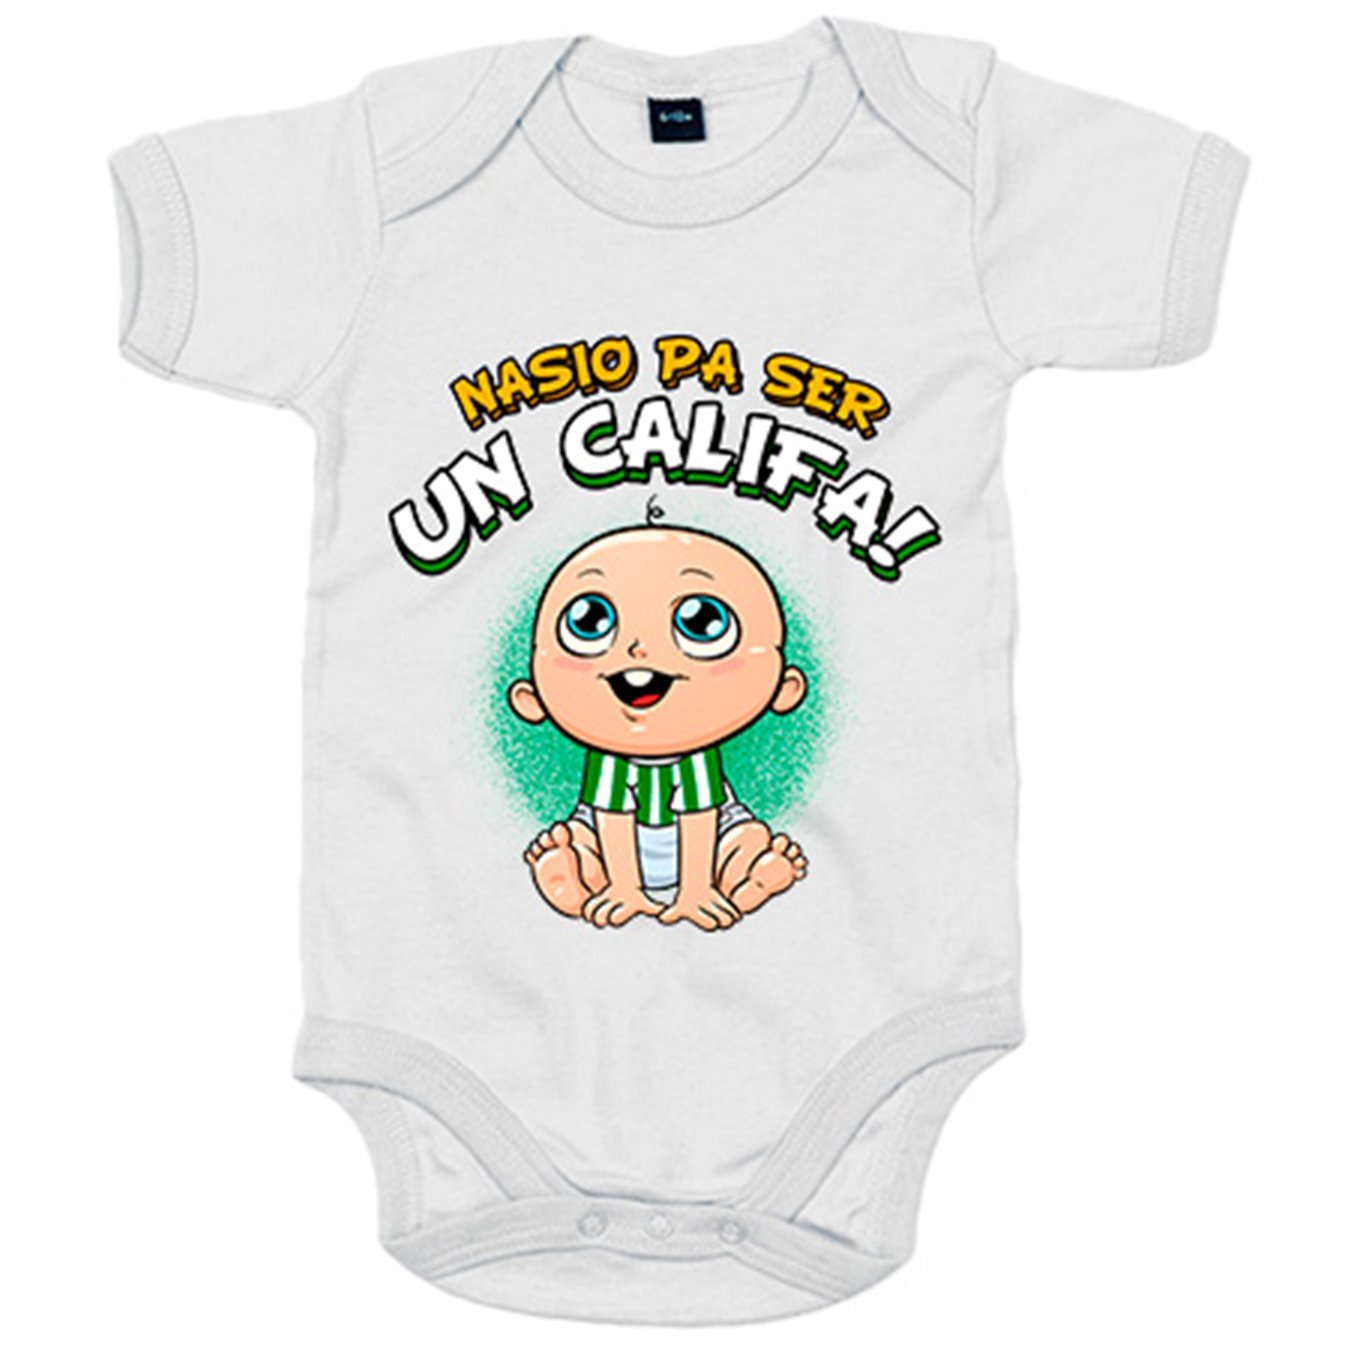 Body bebé nacido para ser Califa Córdoba fútbol - Blanco, 6-12 meses: Amazon.es: Bebé